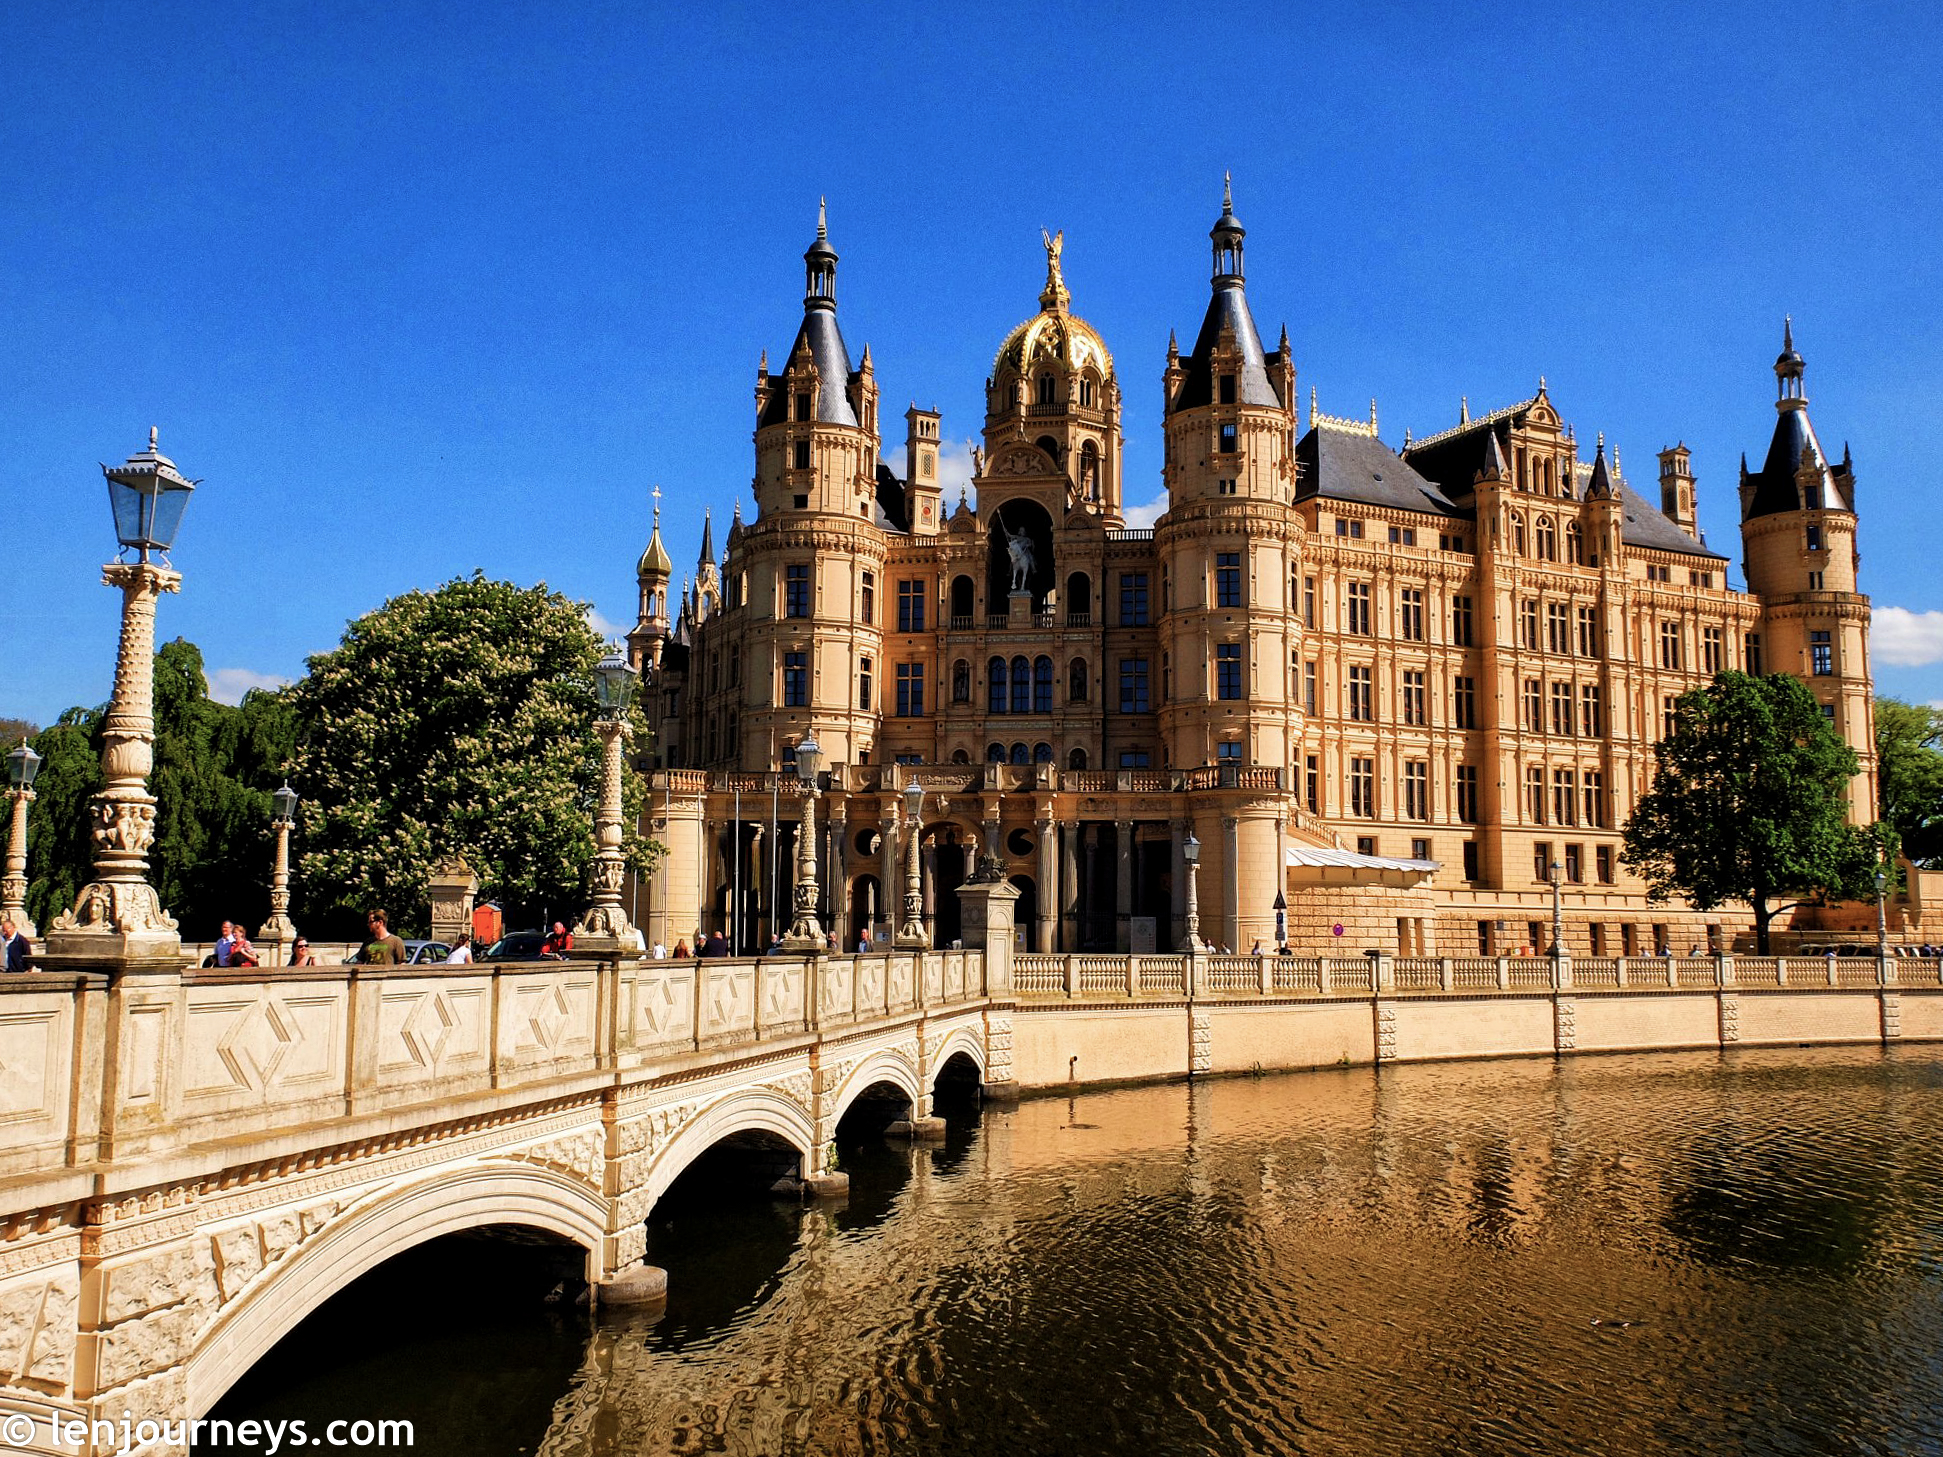 The bridge leading to Schwerin Palace